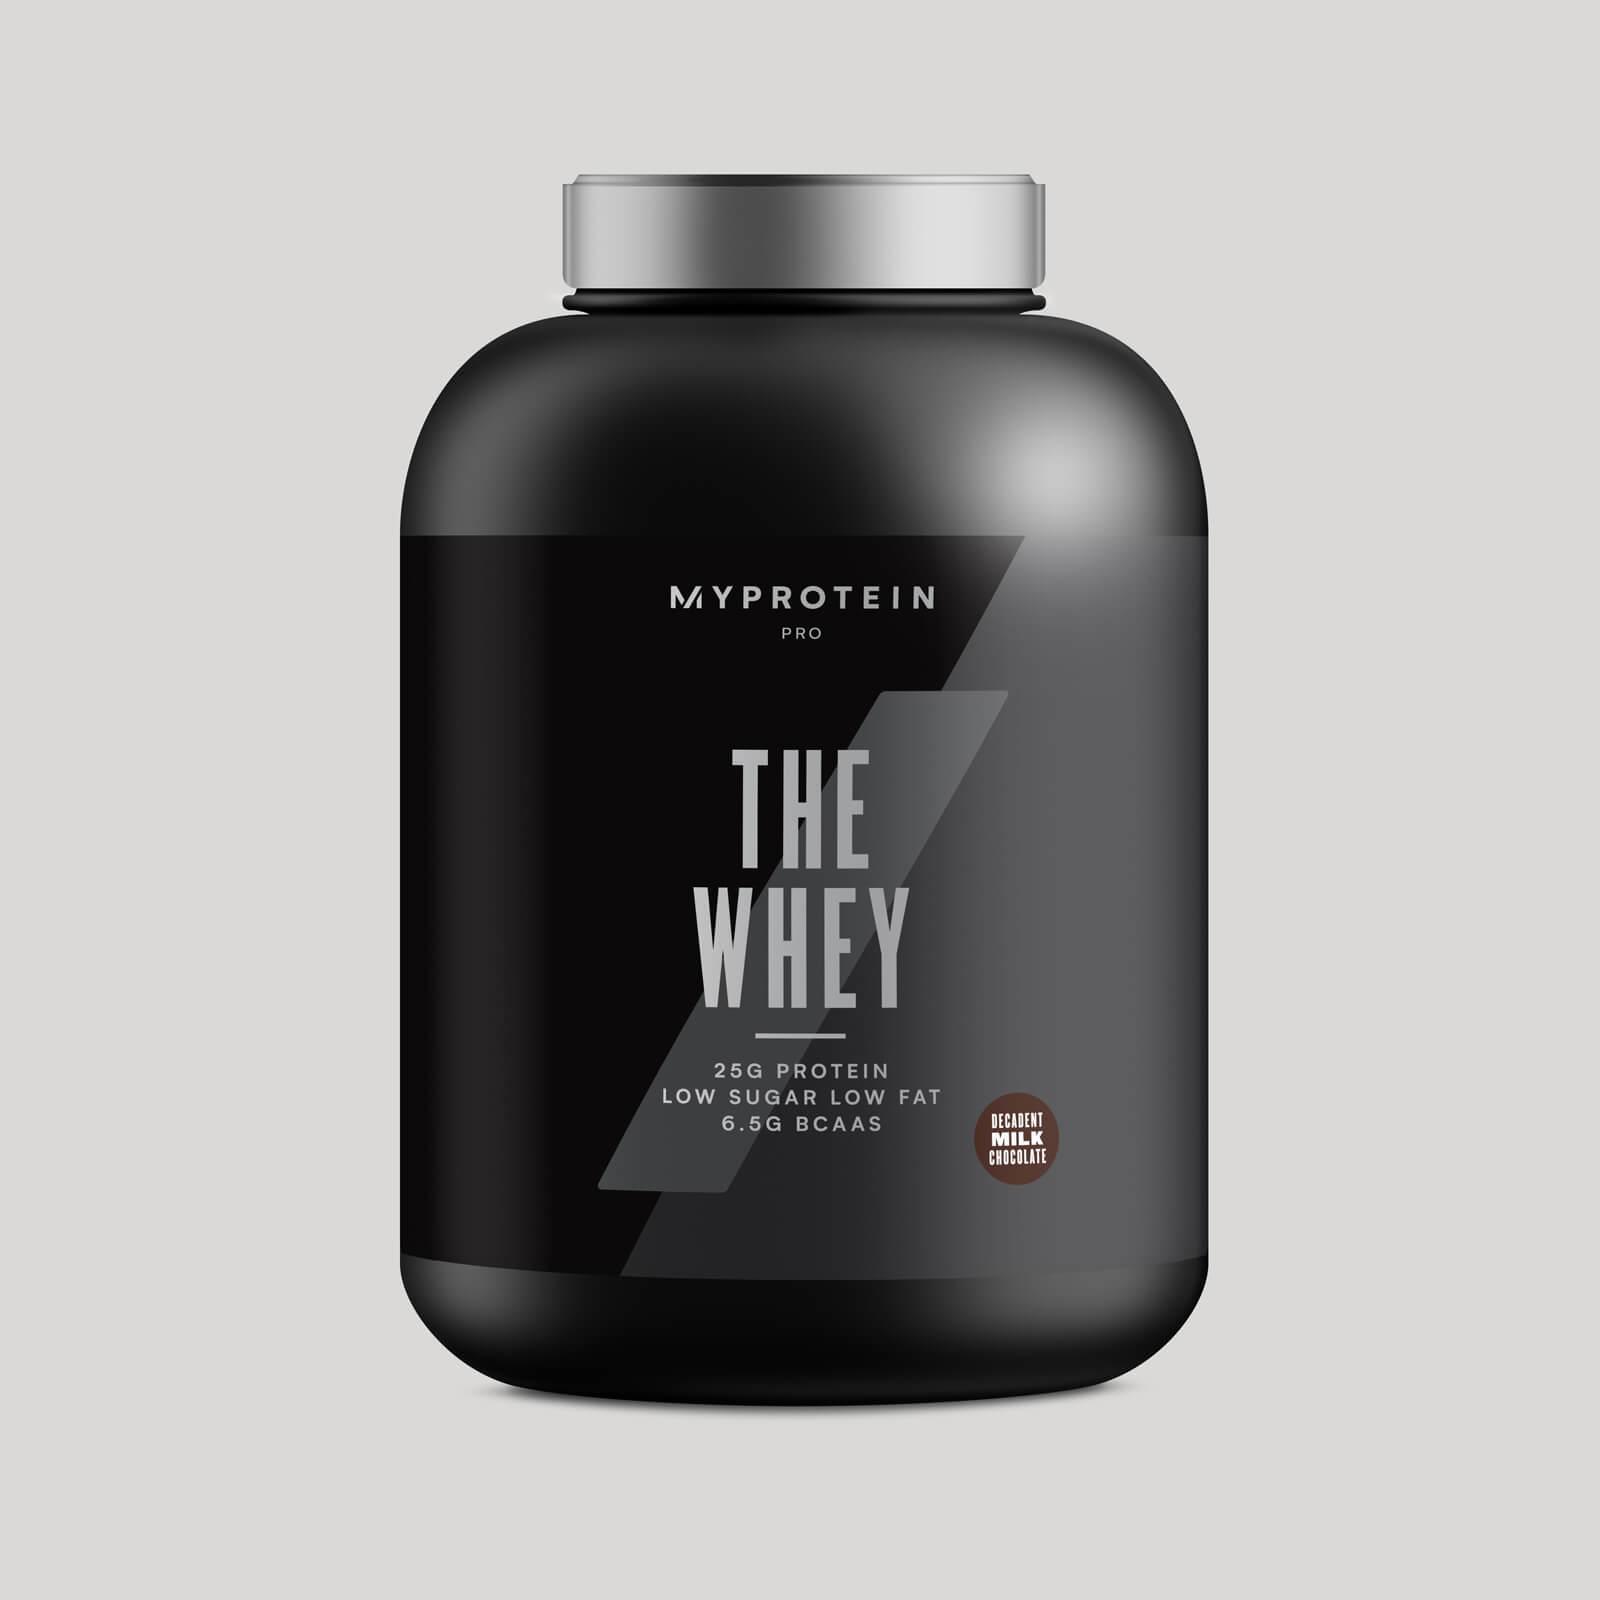 Myprotein THE Whey™ - 60 Servings - 1.8kg - Chocolat au lait